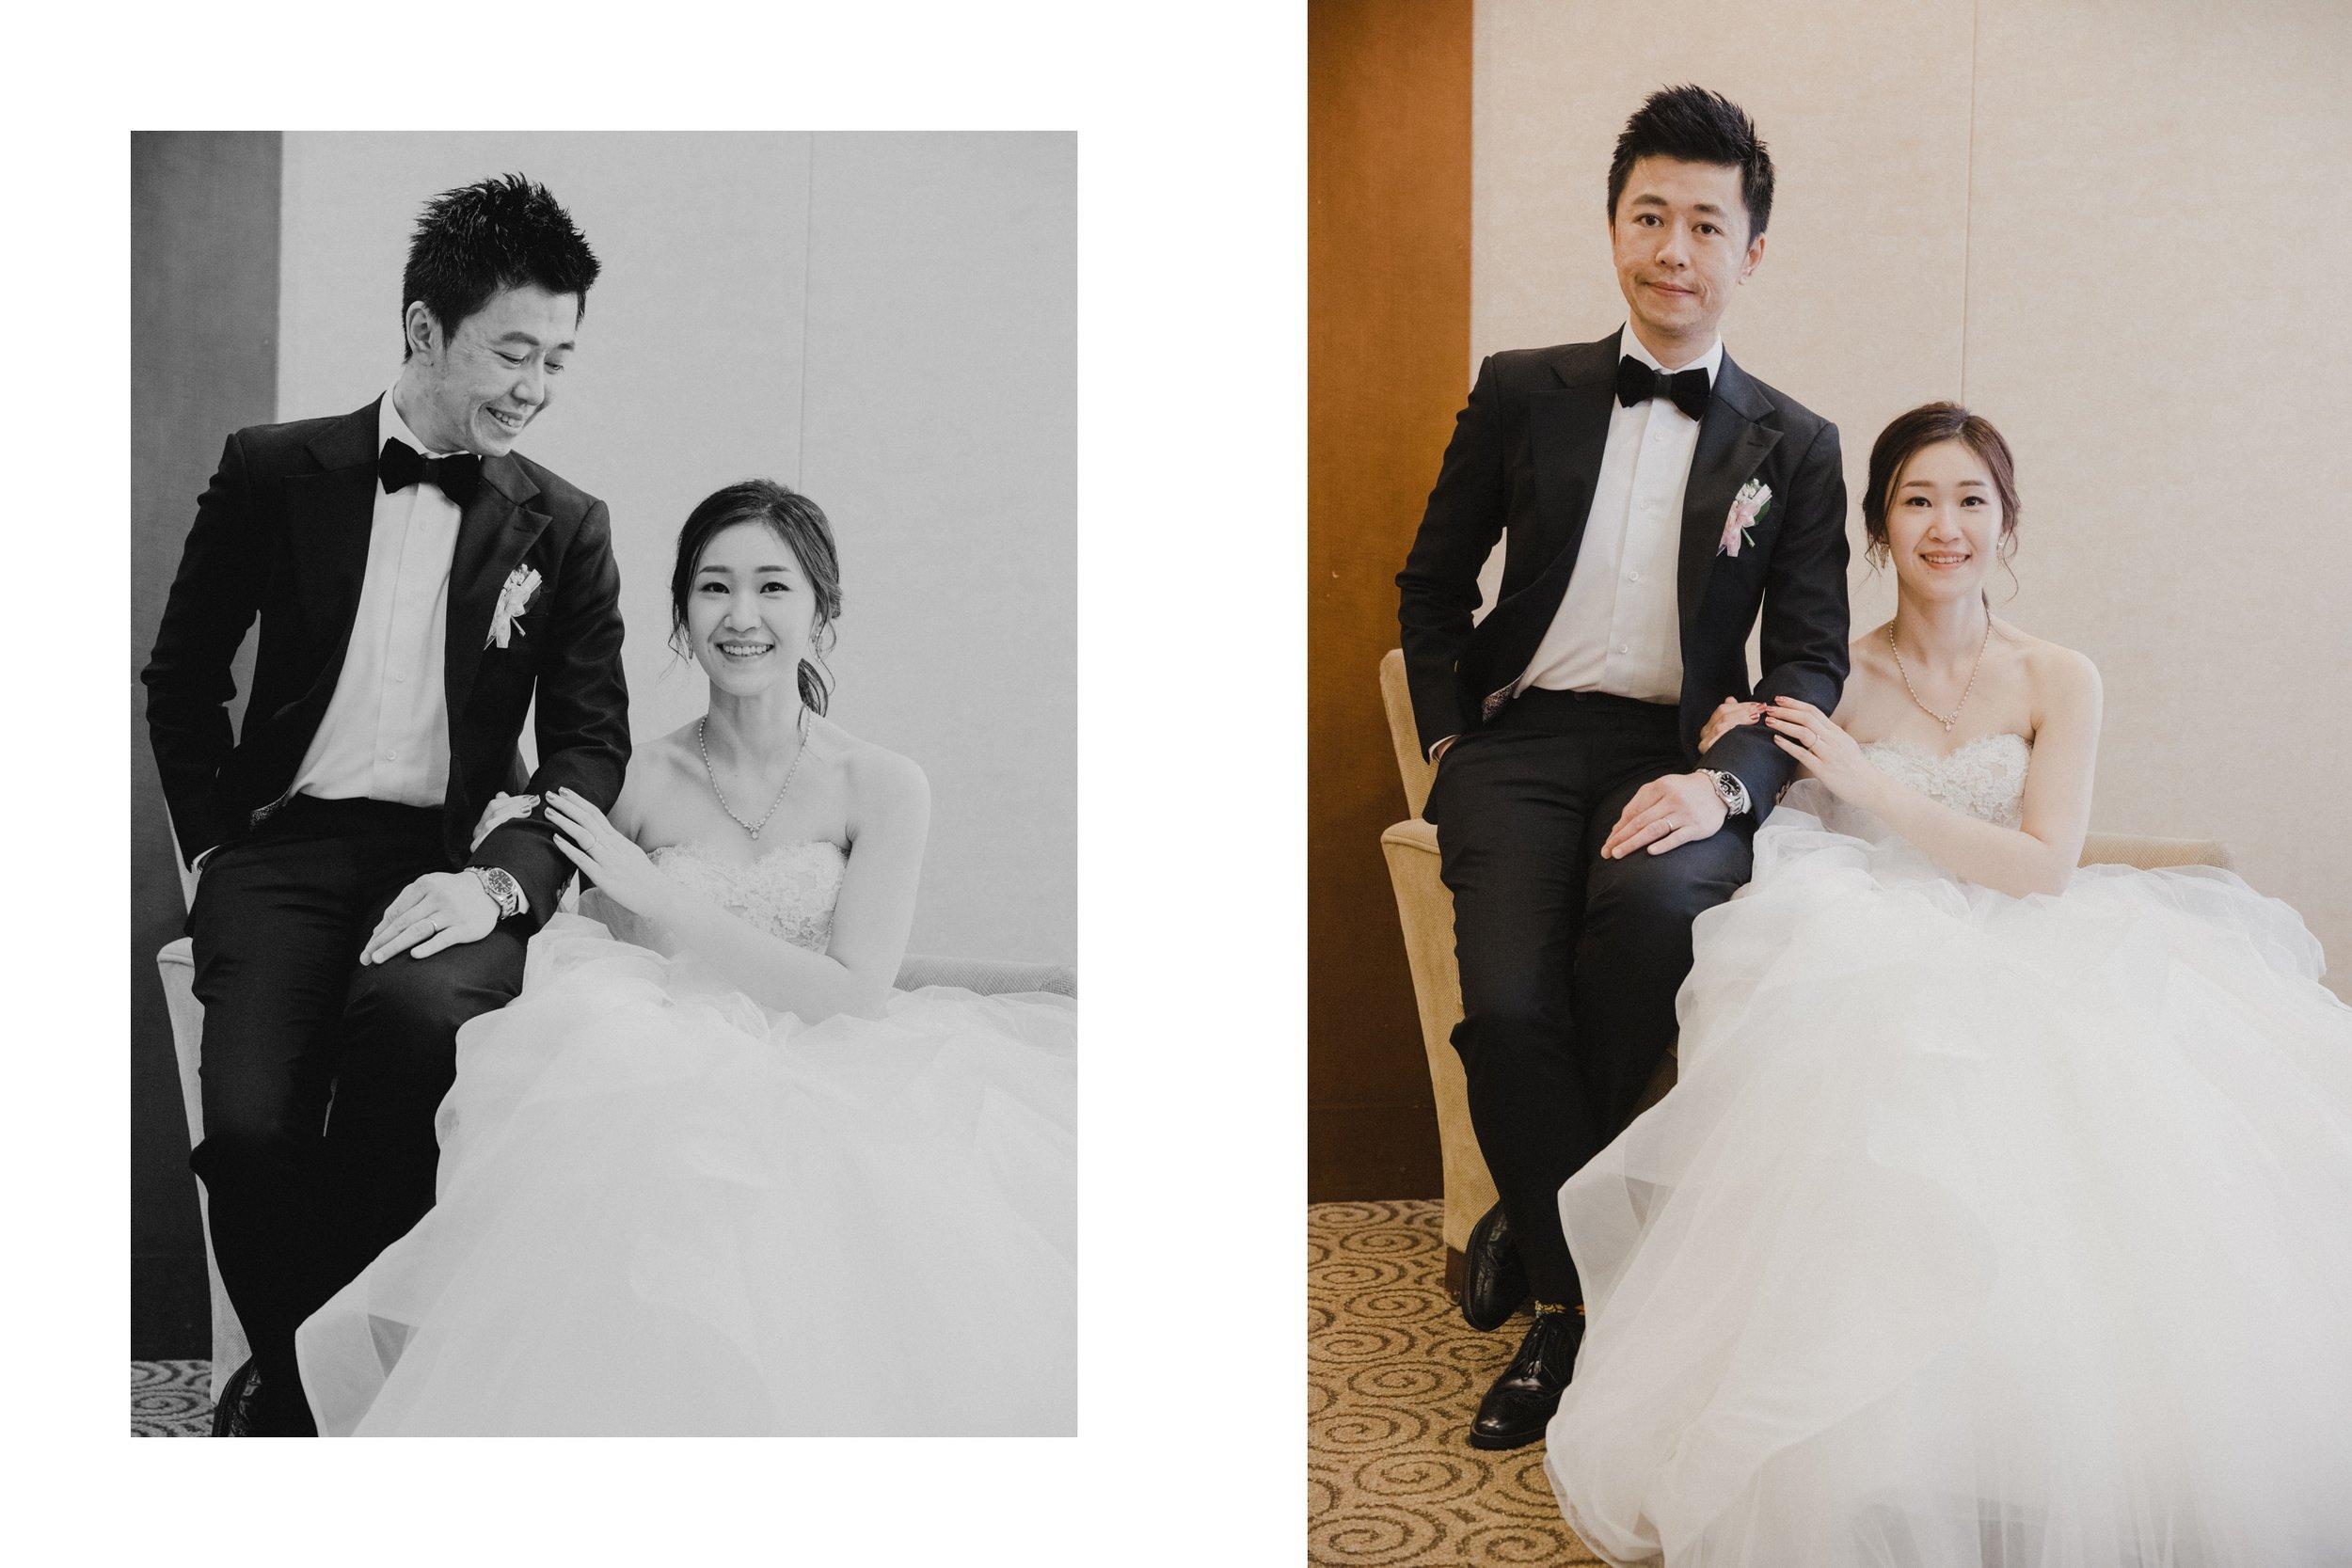 wedding-caridee-oscar-lunch-ambassador-hsinchu-結婚午宴-新竹國賓_144.jpg